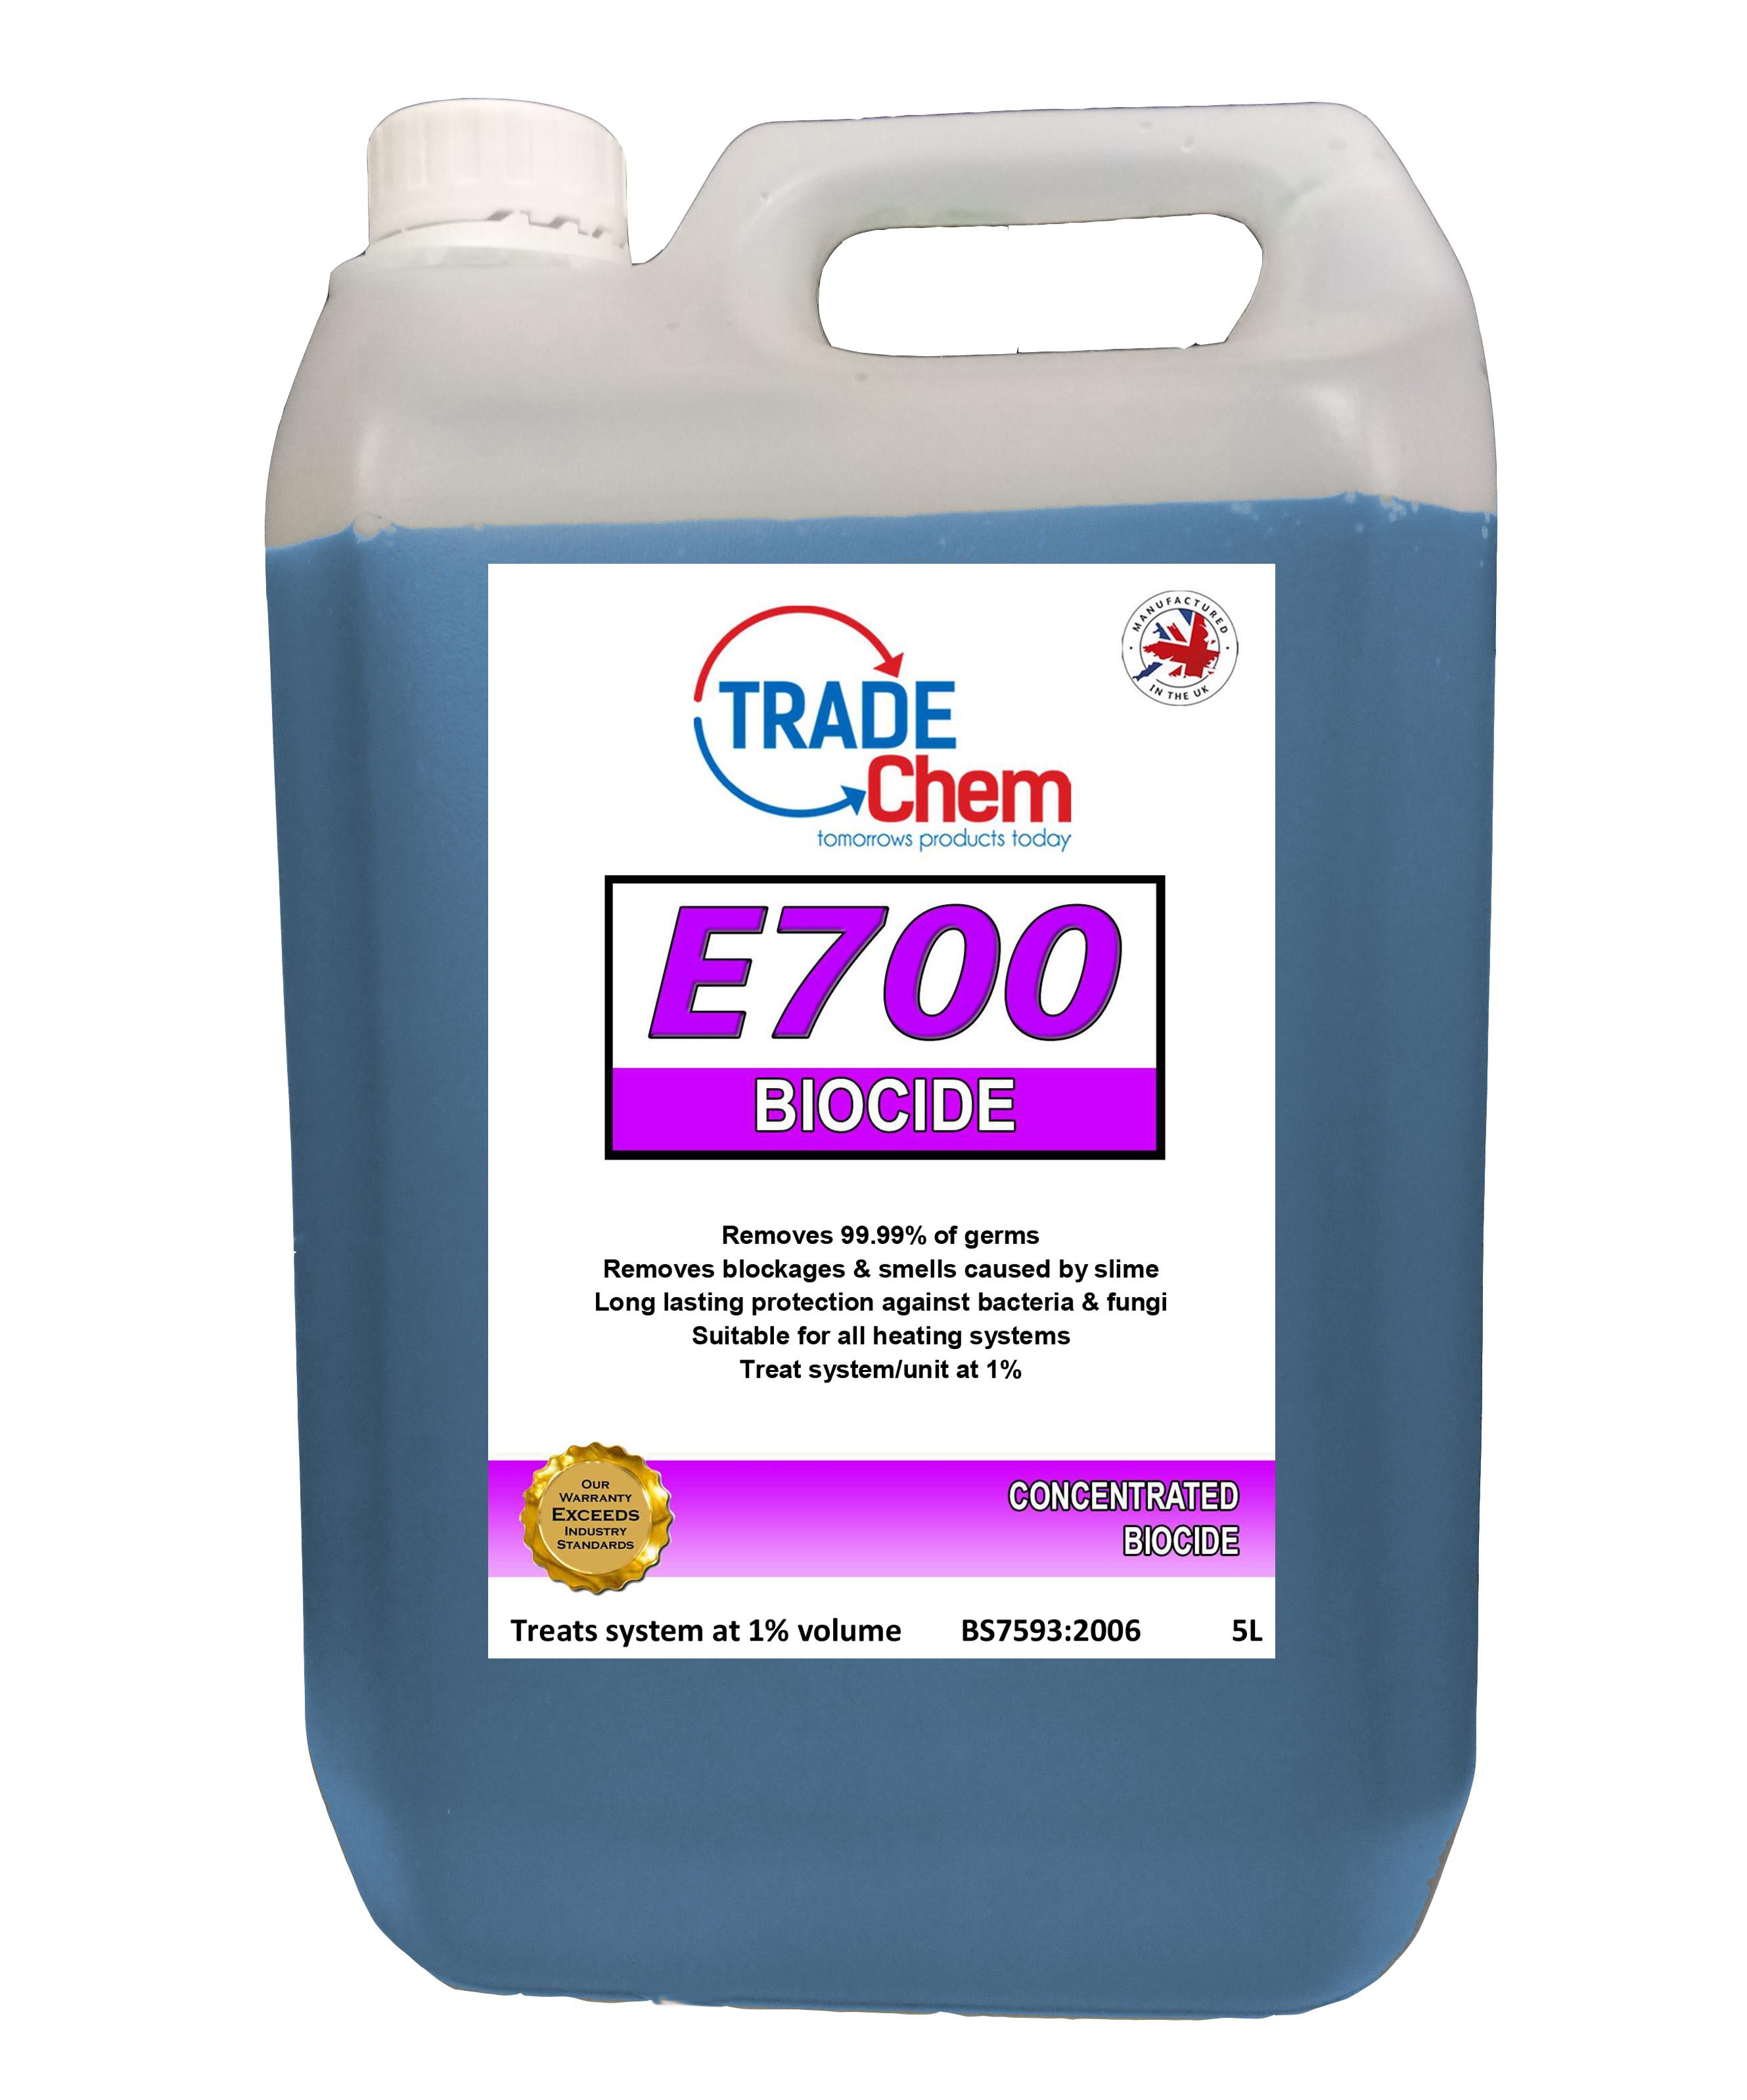 E700 Concentrated Biocide 5L – Trade Chem